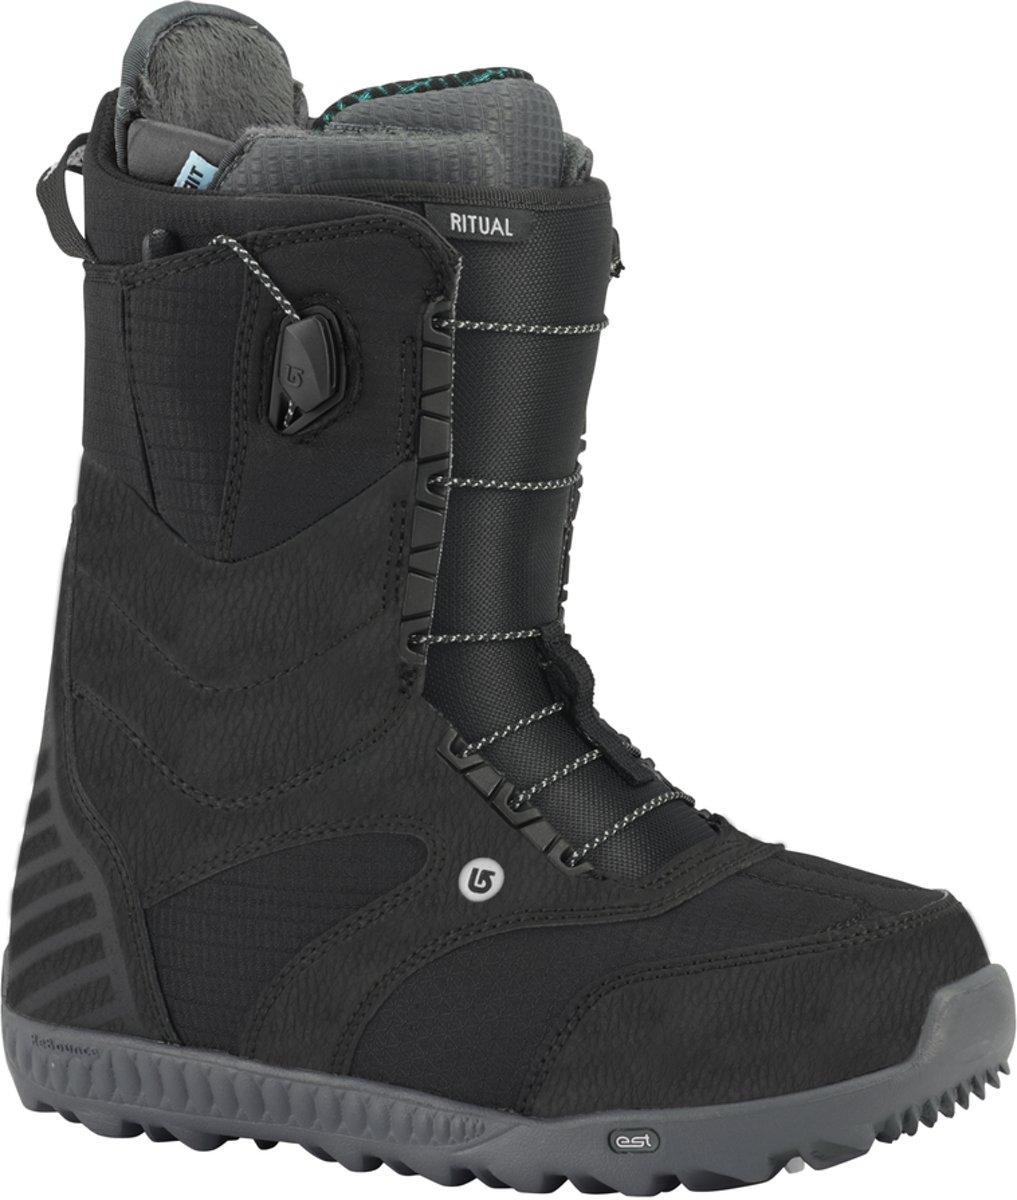 Burton Ritual snowboardschoenen black